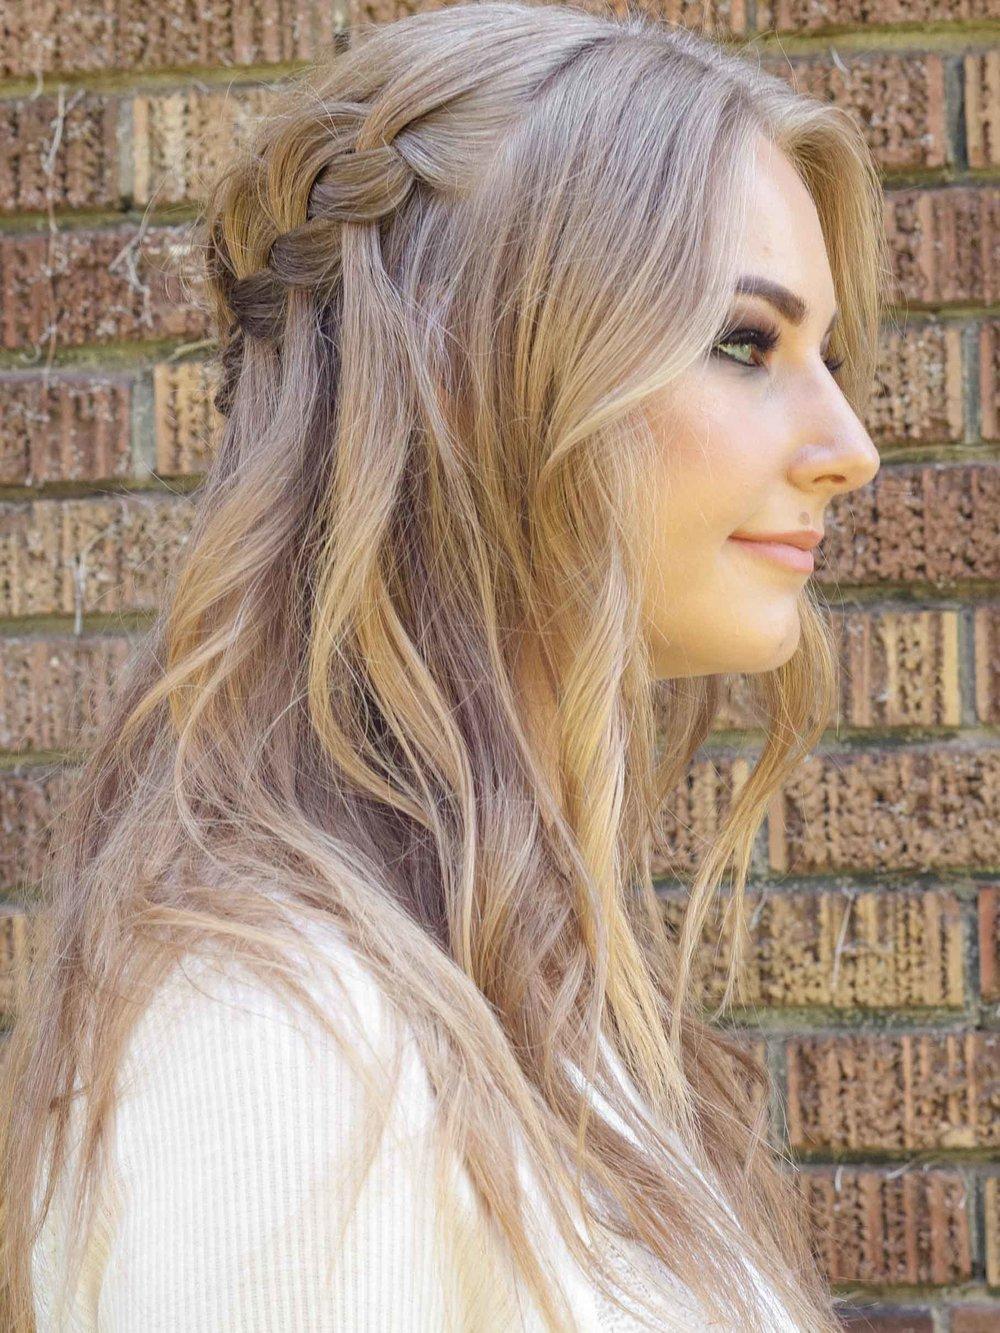 talia-whatcott-makeup-artist-portfolio-blog-hair-waterfall-braid-smoky-eye-matte-lip-bridal-wedding-tousled-curls-1-4.jpg